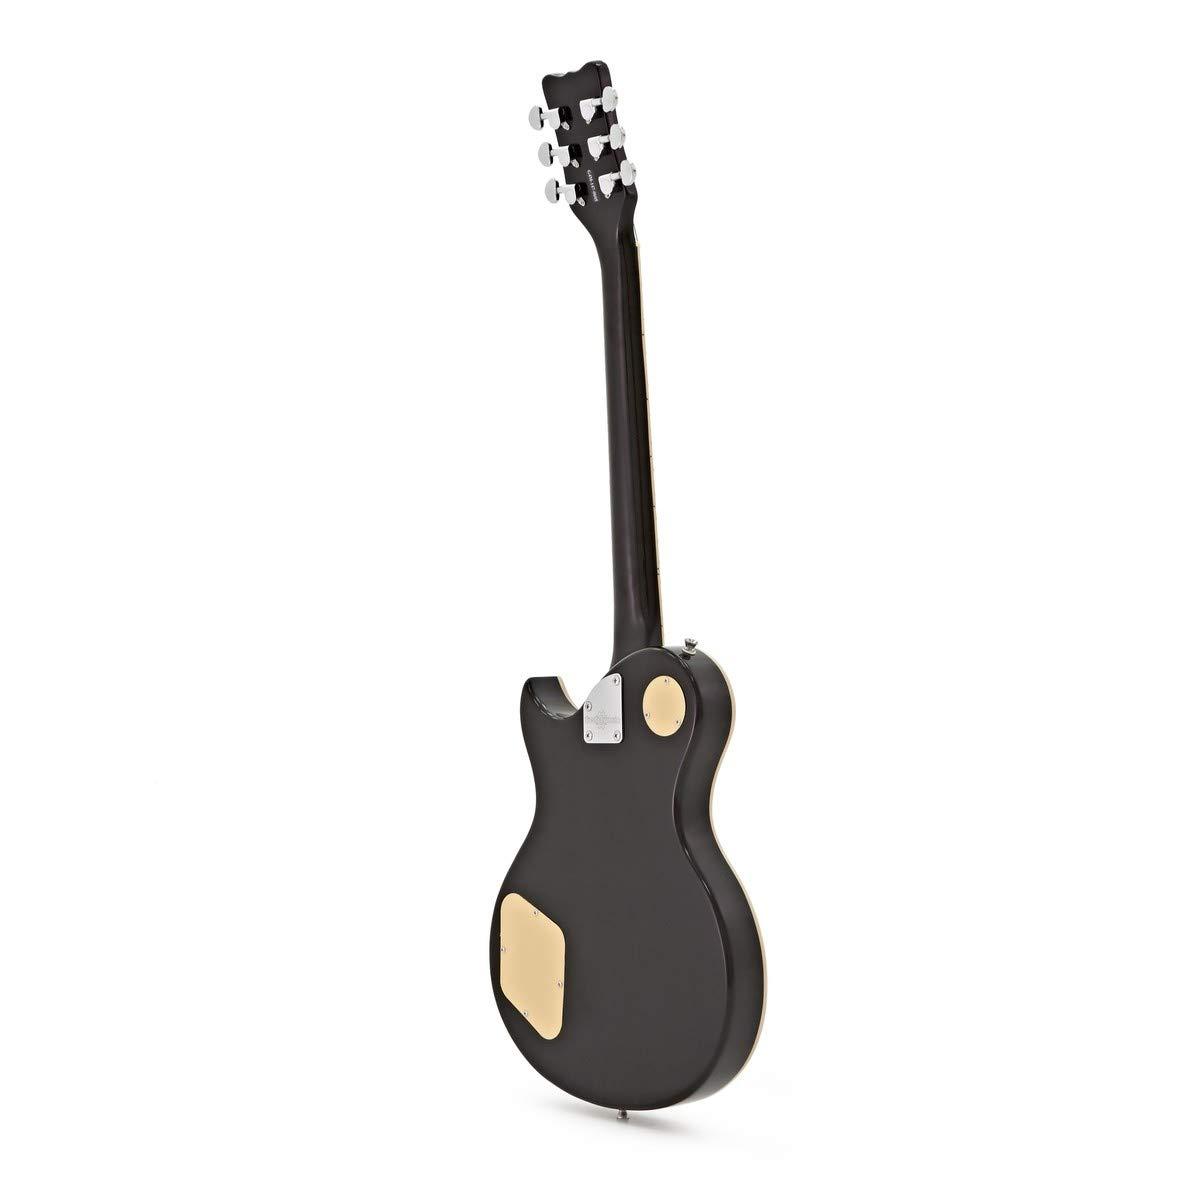 Guitarra Eléctrica New Jersey + Pack Completo - Union Jack: Amazon.es: Instrumentos musicales